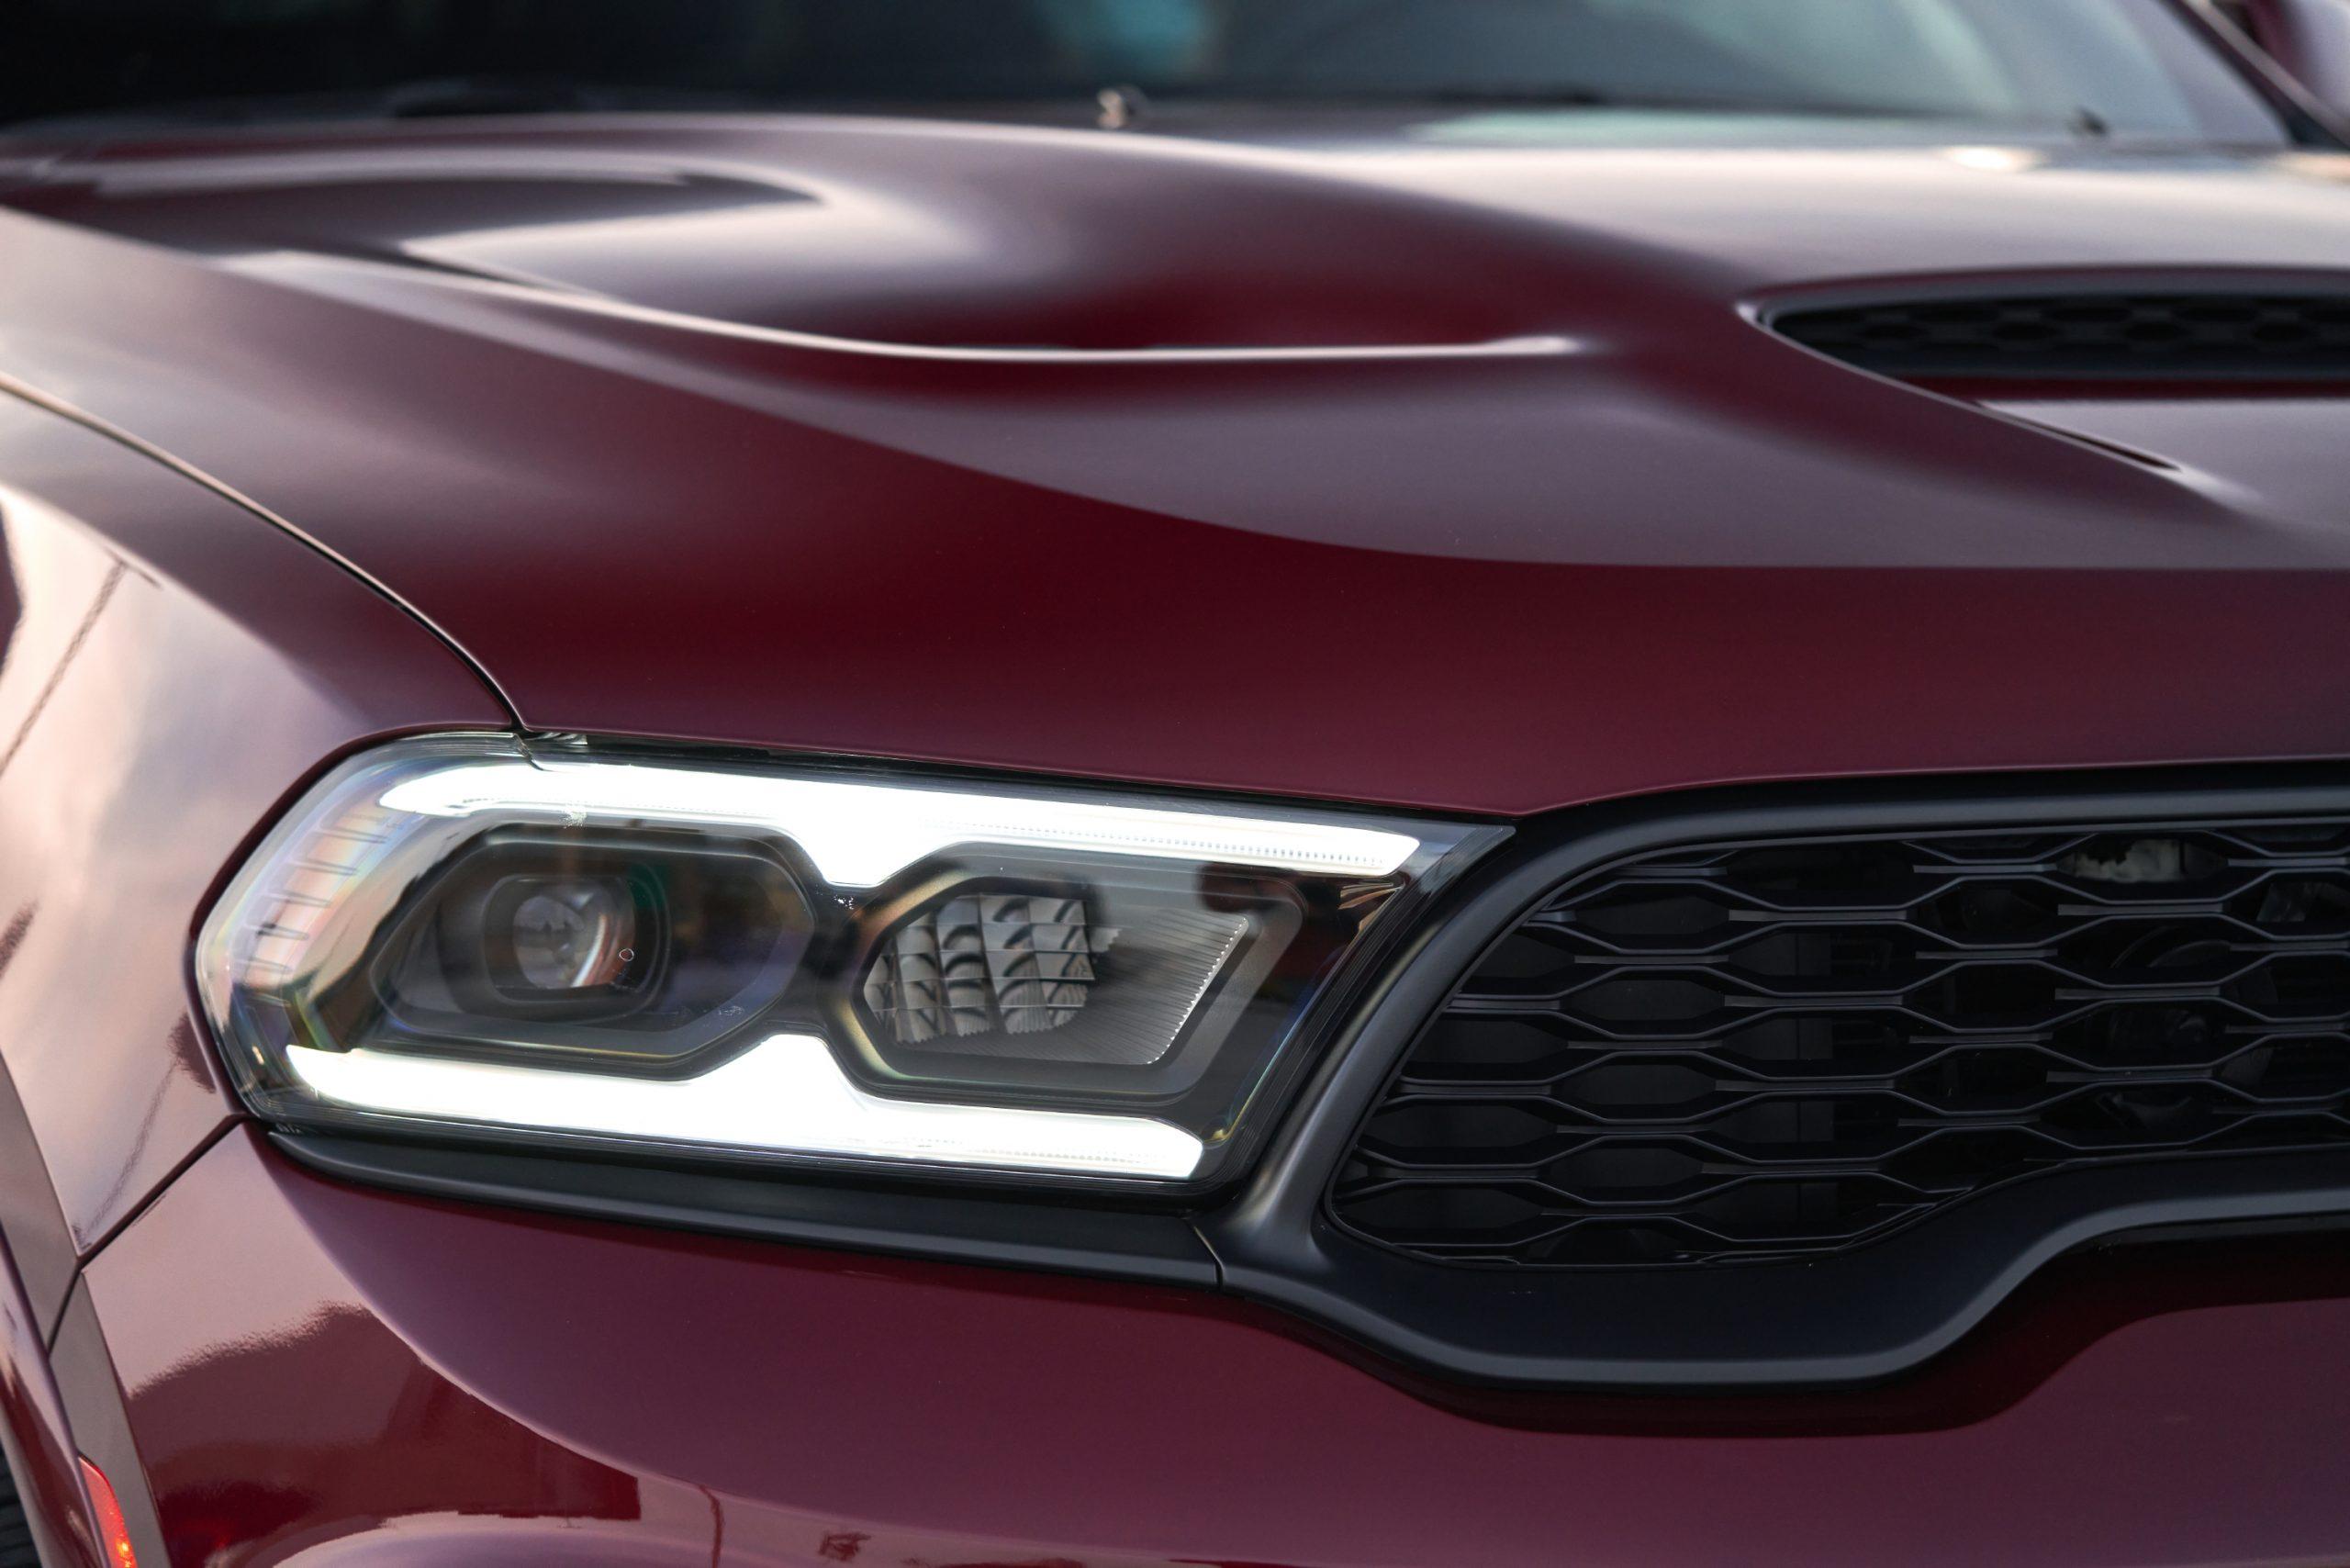 2021 Dodge Durango SRT Hellcat octane red headlight